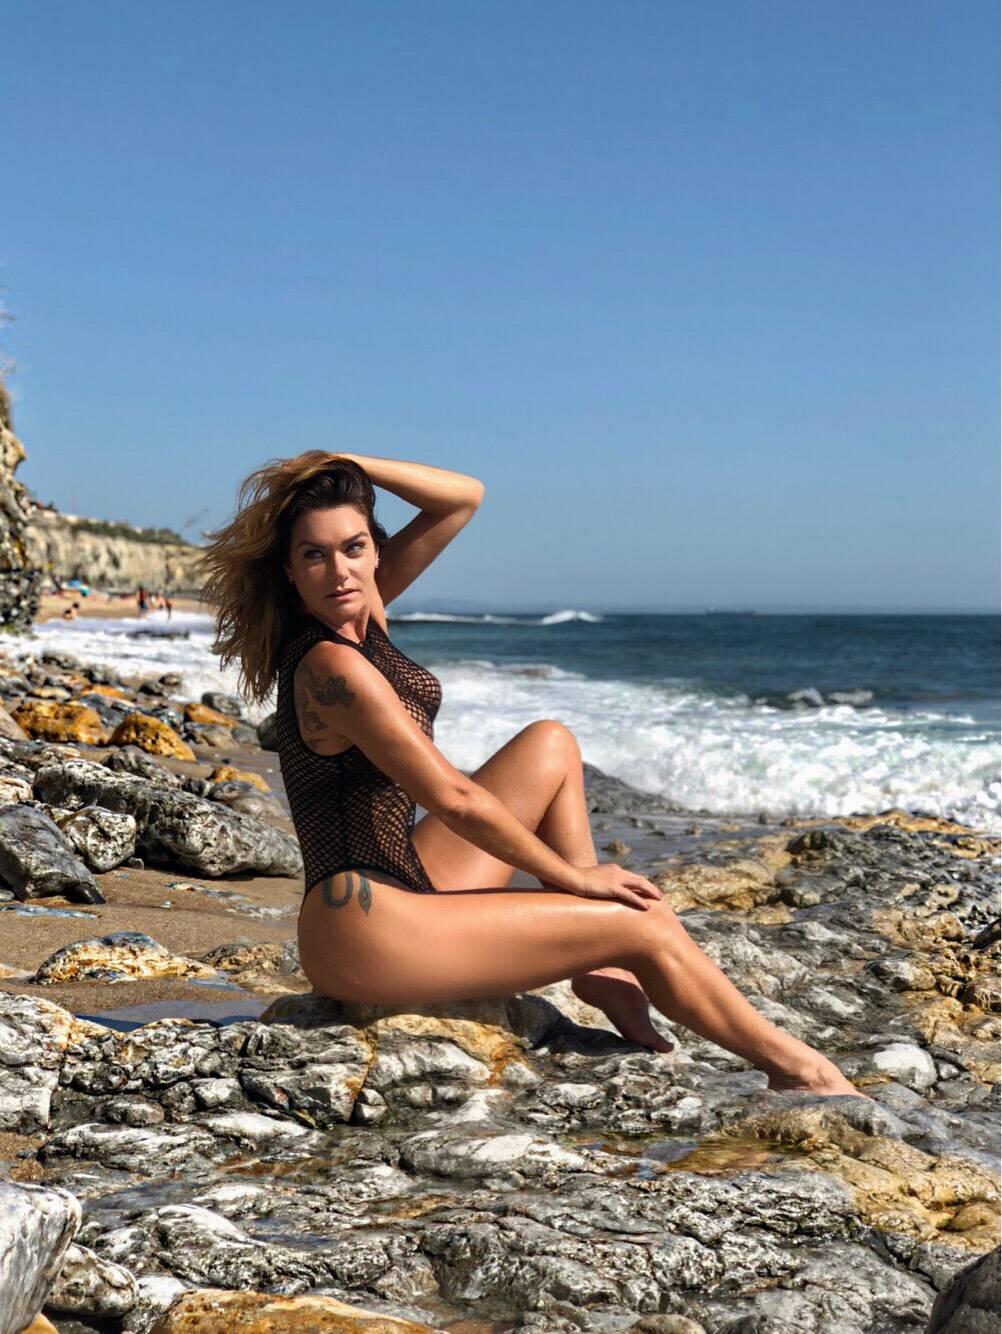 Luize Altenhofen em Portugal. Foto: Del Santana